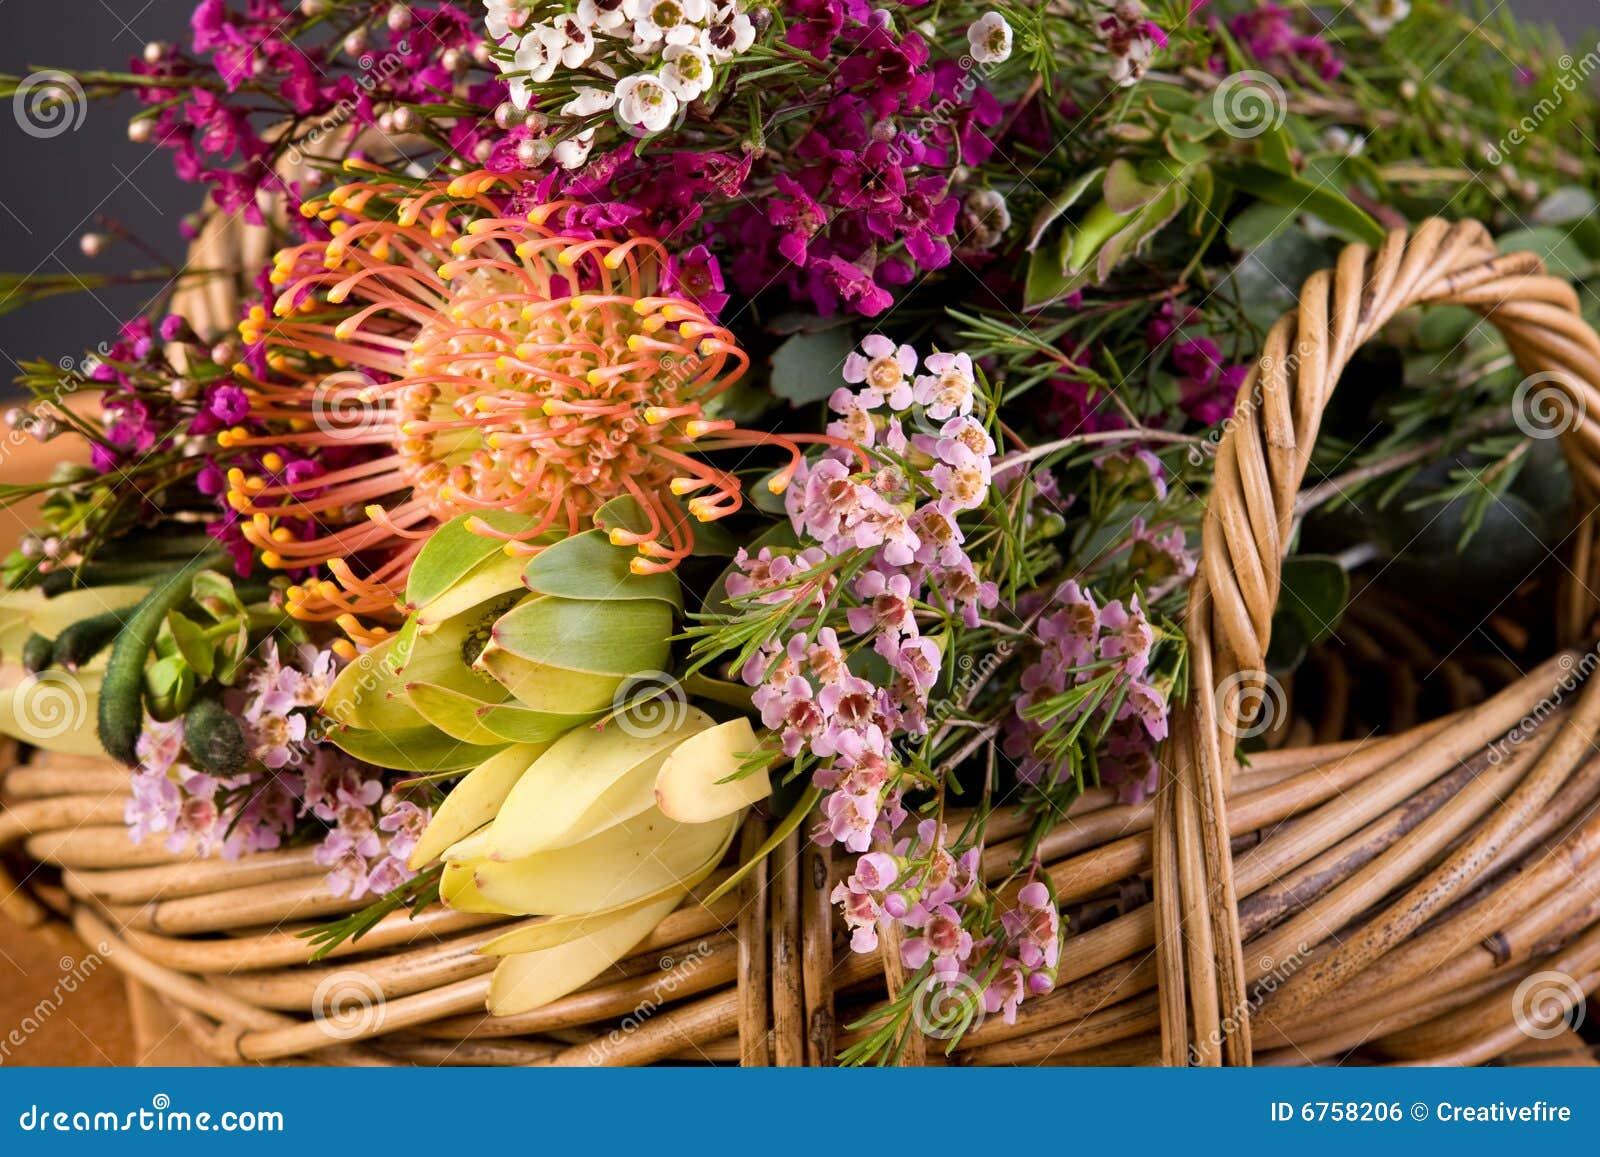 Australian Native Flower Bouquet Stock Photo Image Of Wildflowers